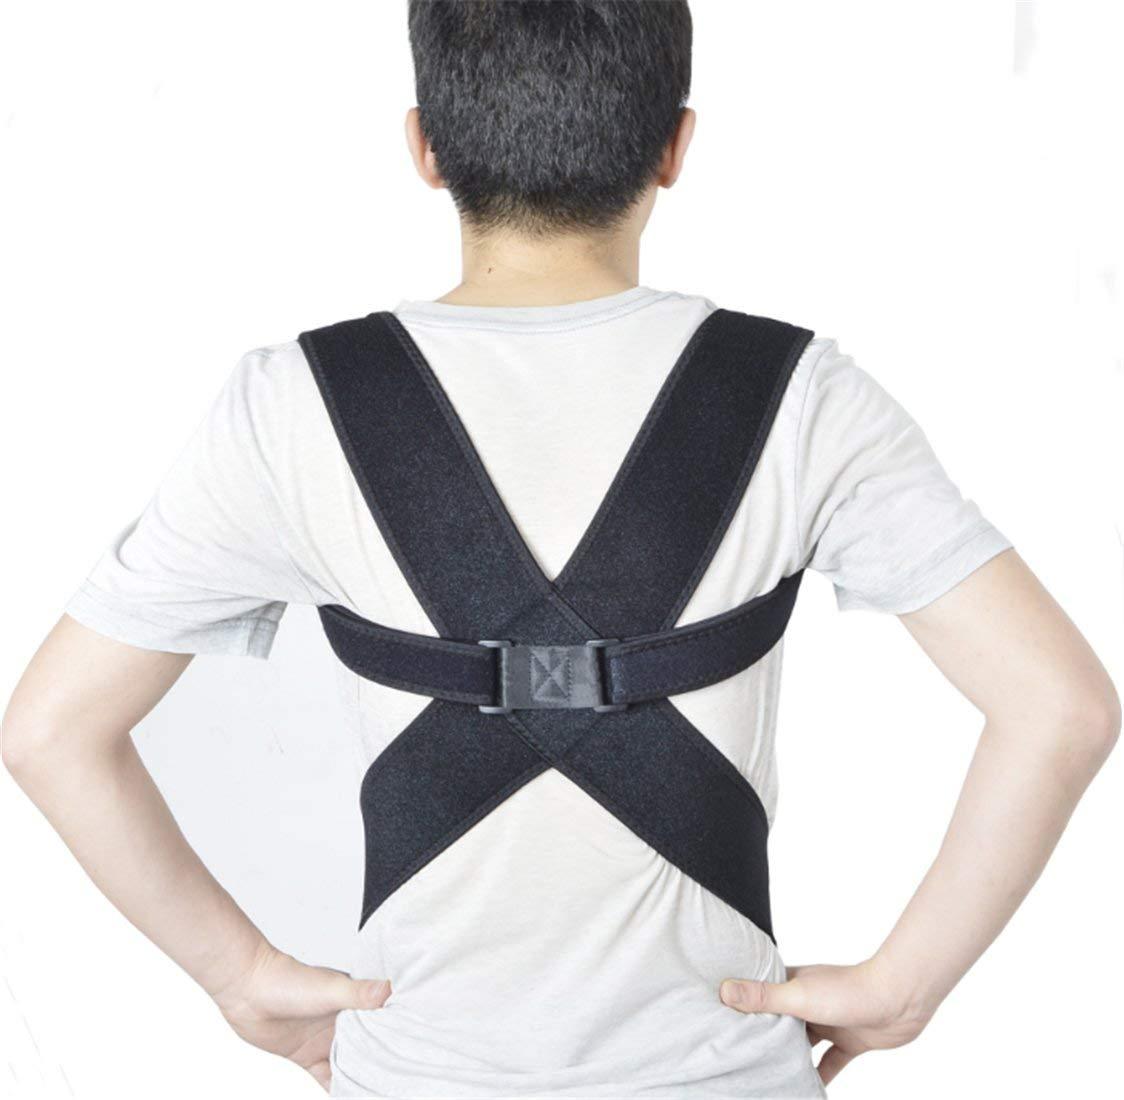 Yeying123 Humpback Correction Belt Adult Spine Back Correction Adjustable Correction Hunchback Correction Belt,L